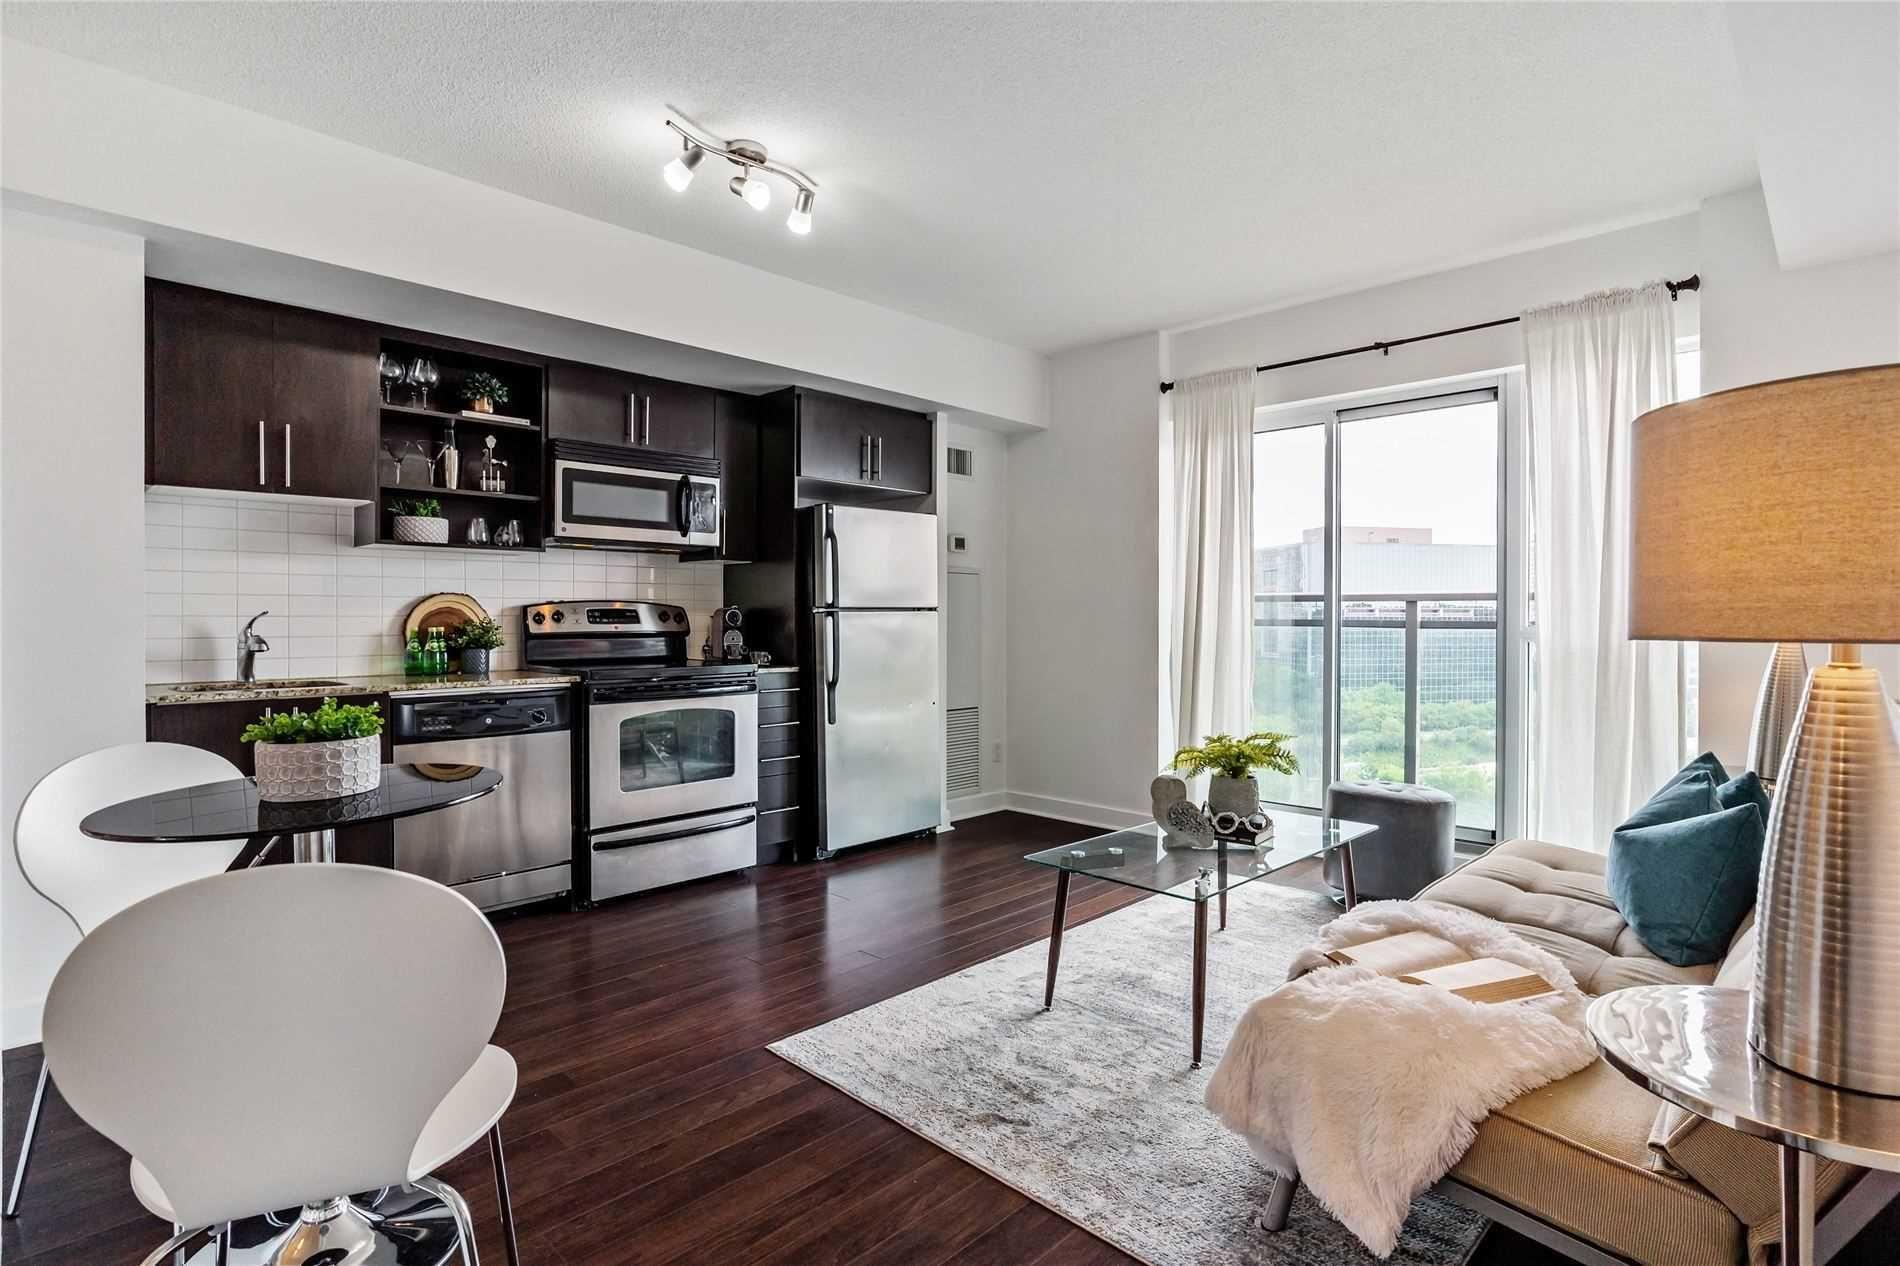 Main Photo: 817 120 Dallimore Circle in Toronto: Banbury-Don Mills Condo for sale (Toronto C13)  : MLS®# C5310379